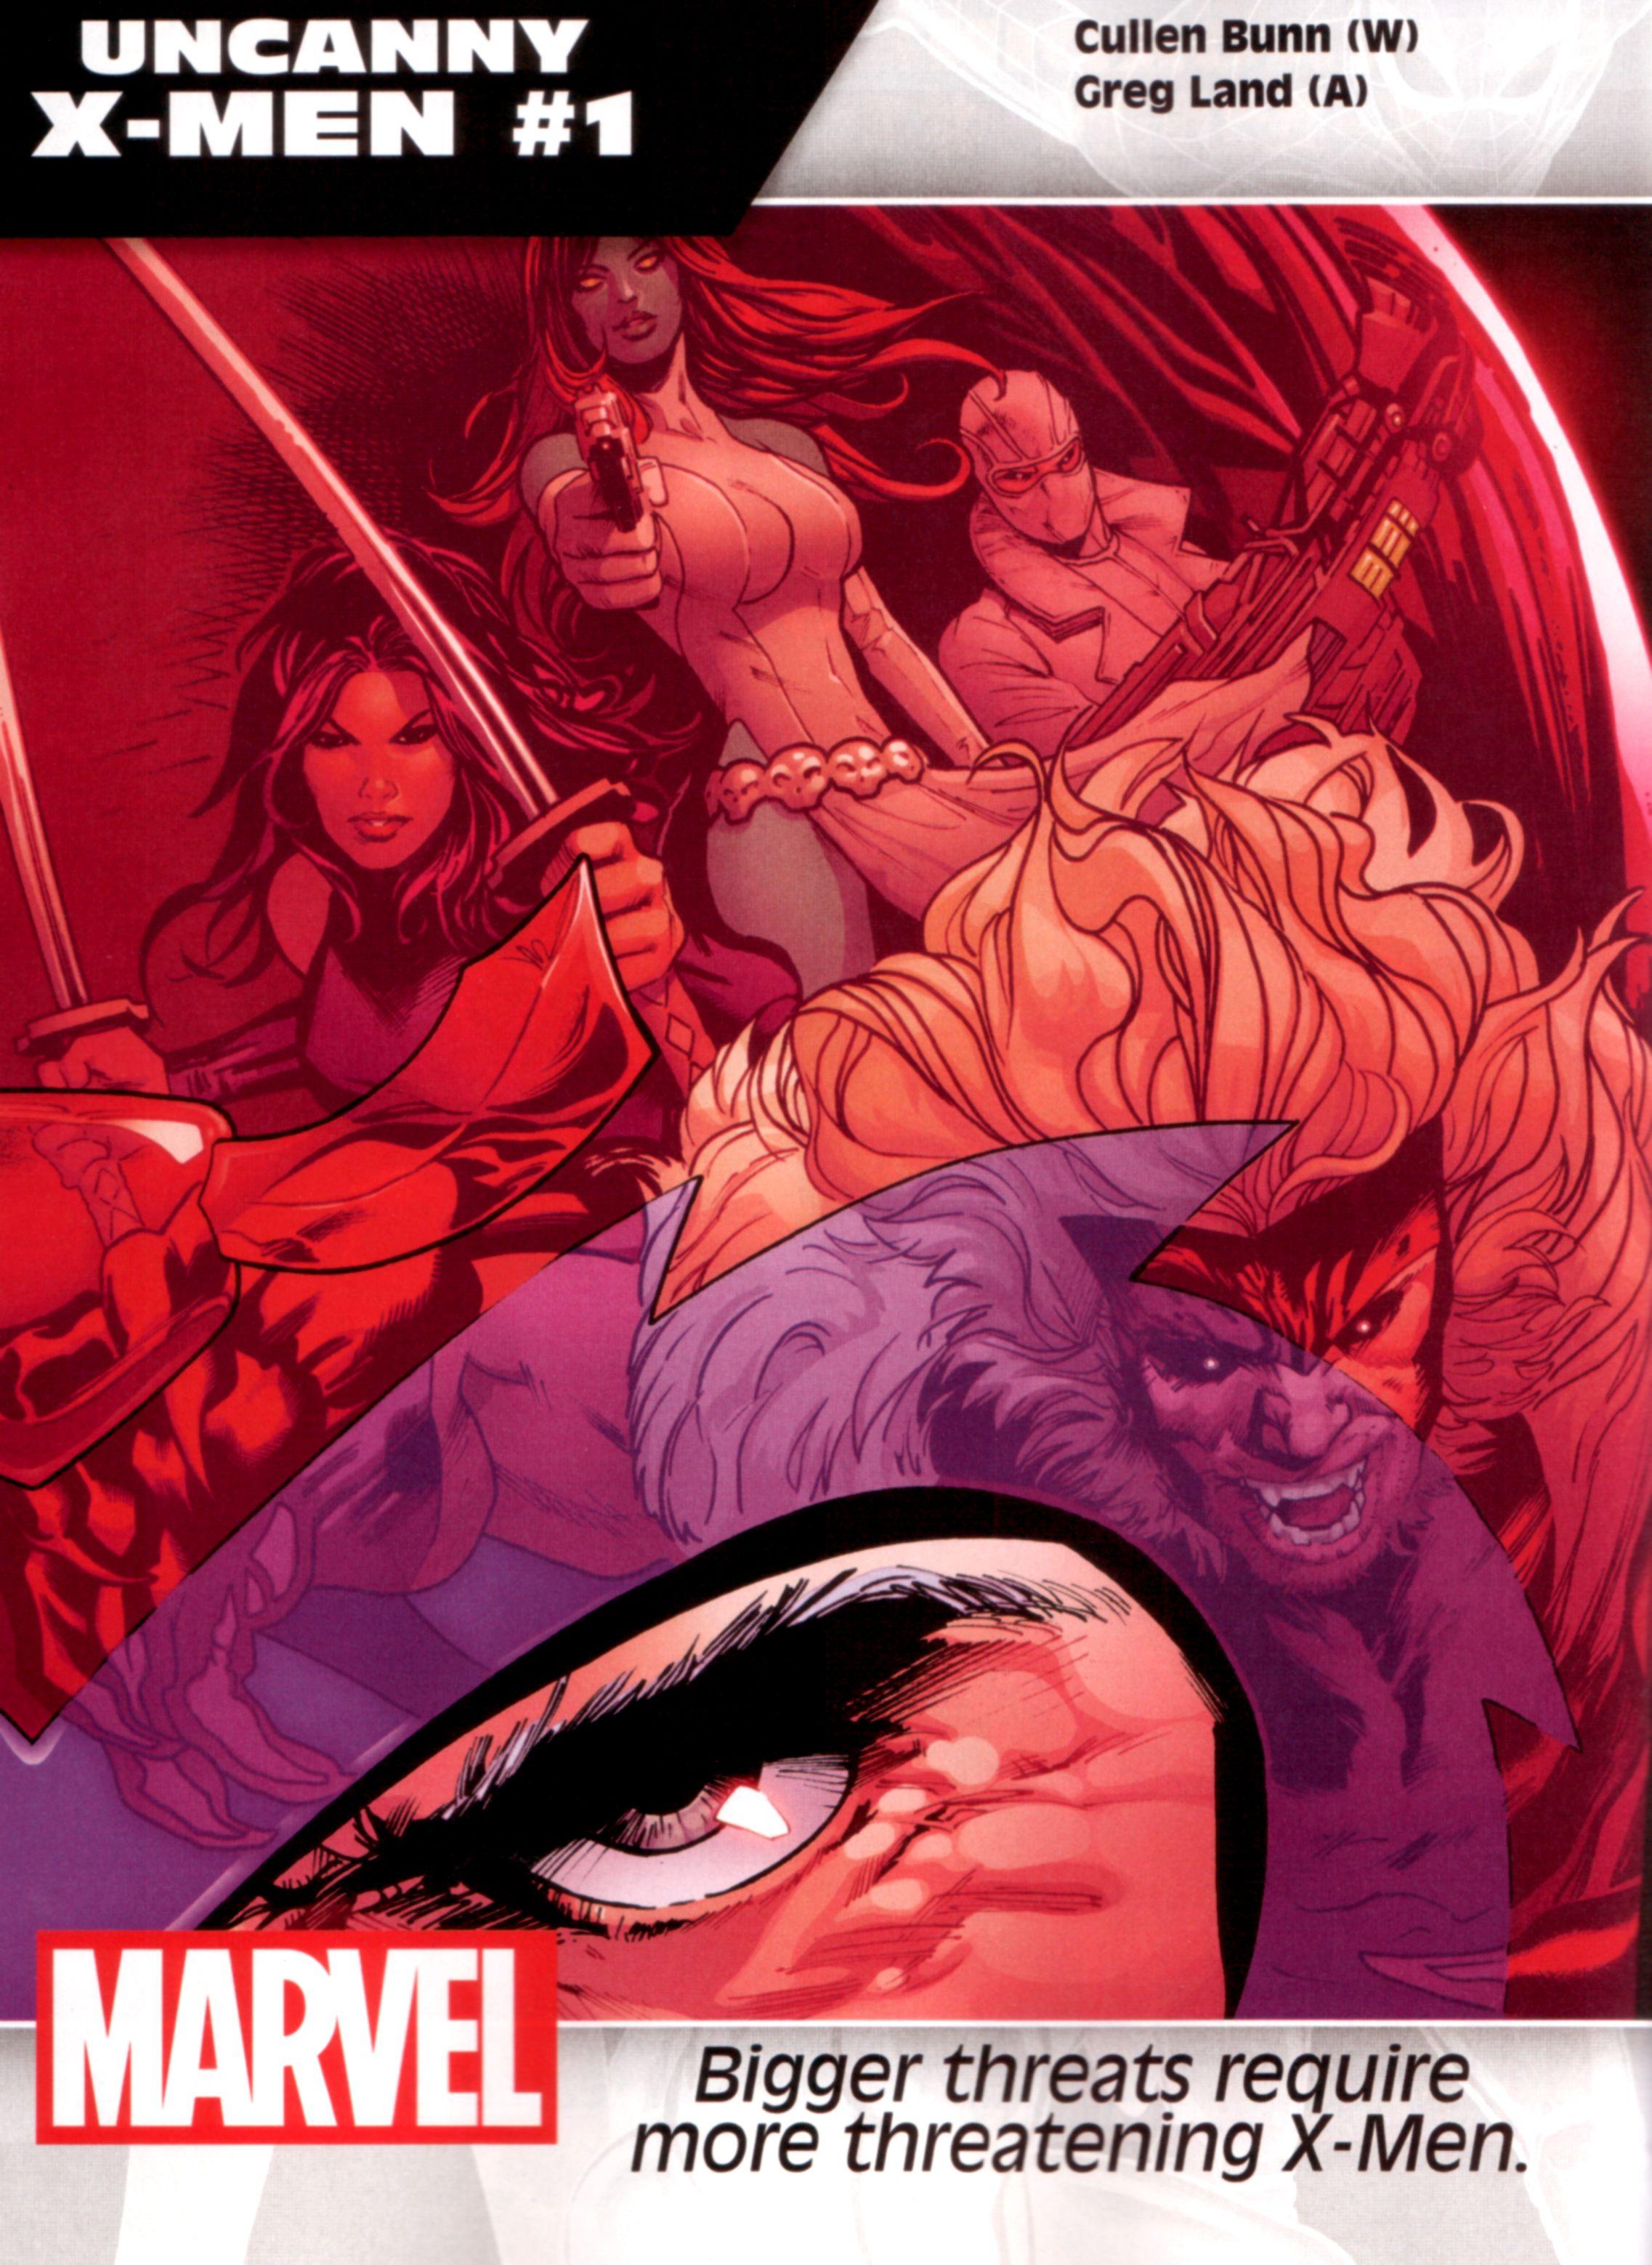 Uncanny X-Men #1 Volume 4 Midtown Comics